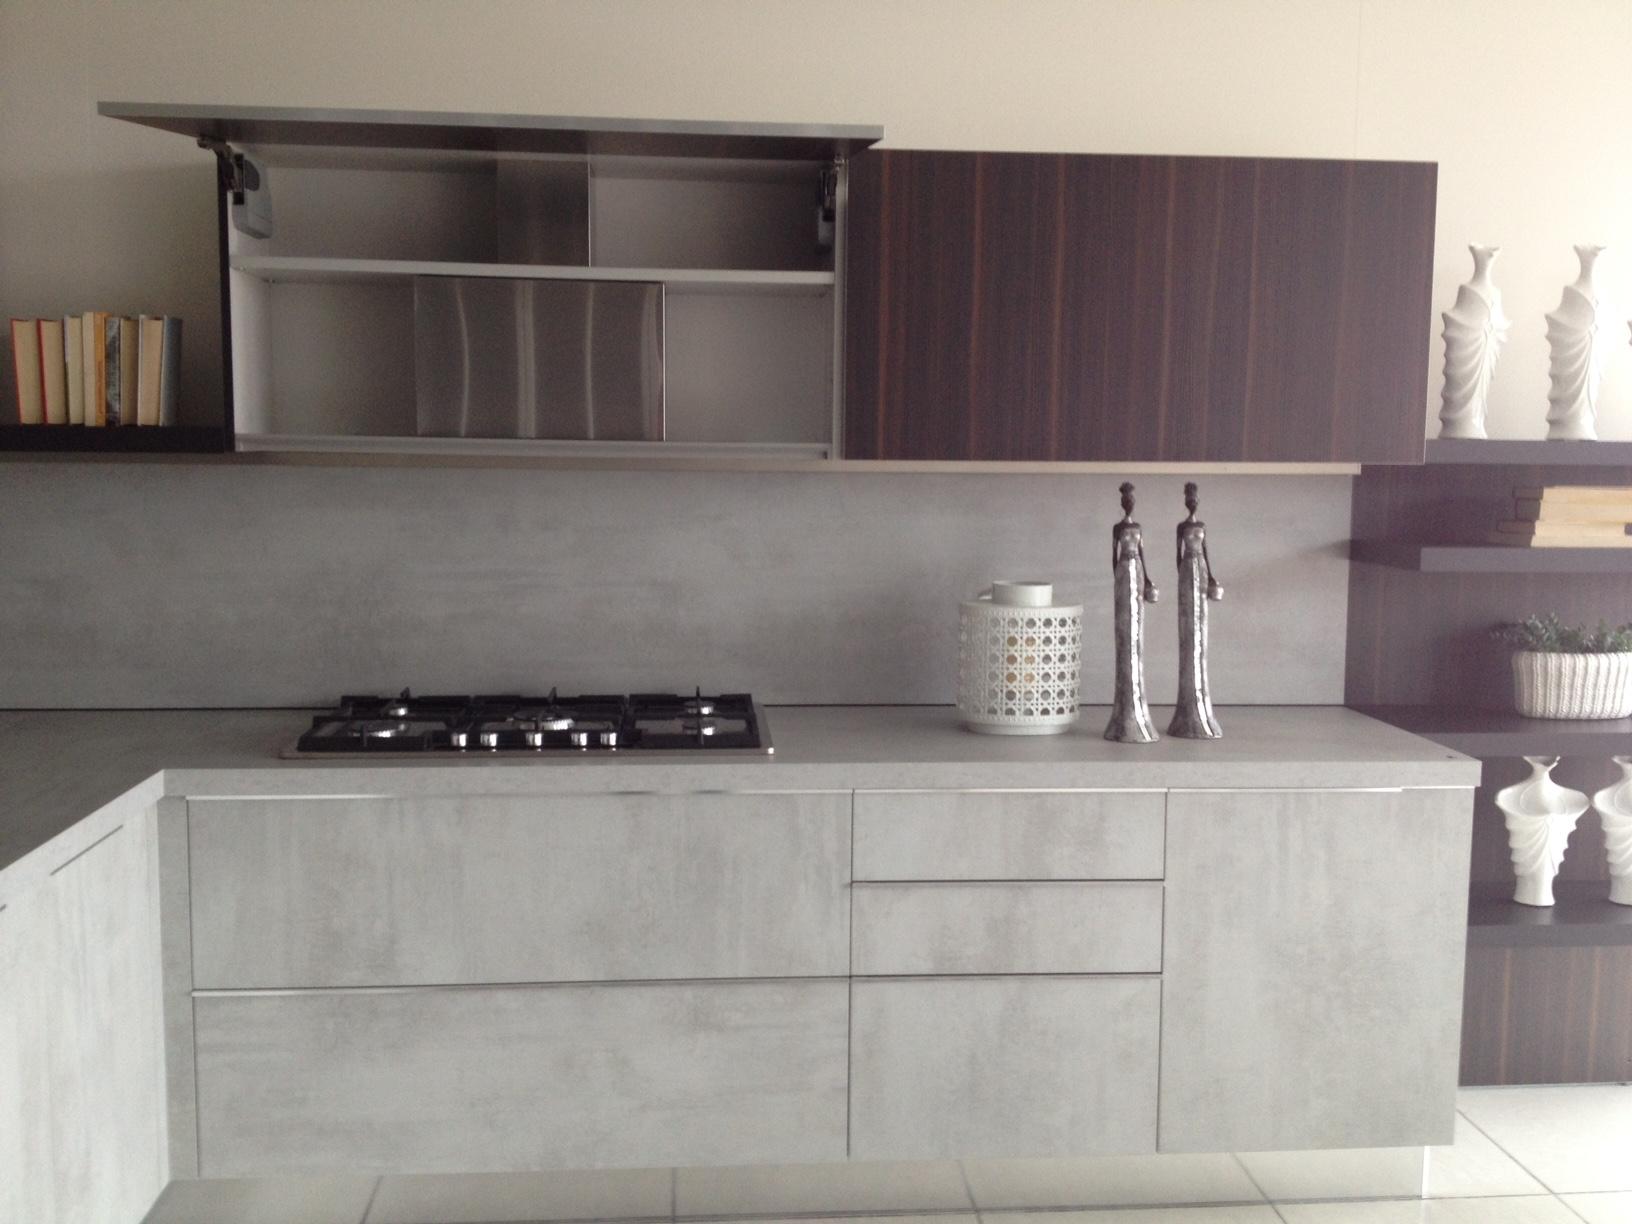 Cucine in cemento pw17 regardsdefemmes - Cucine stosa opinioni ...